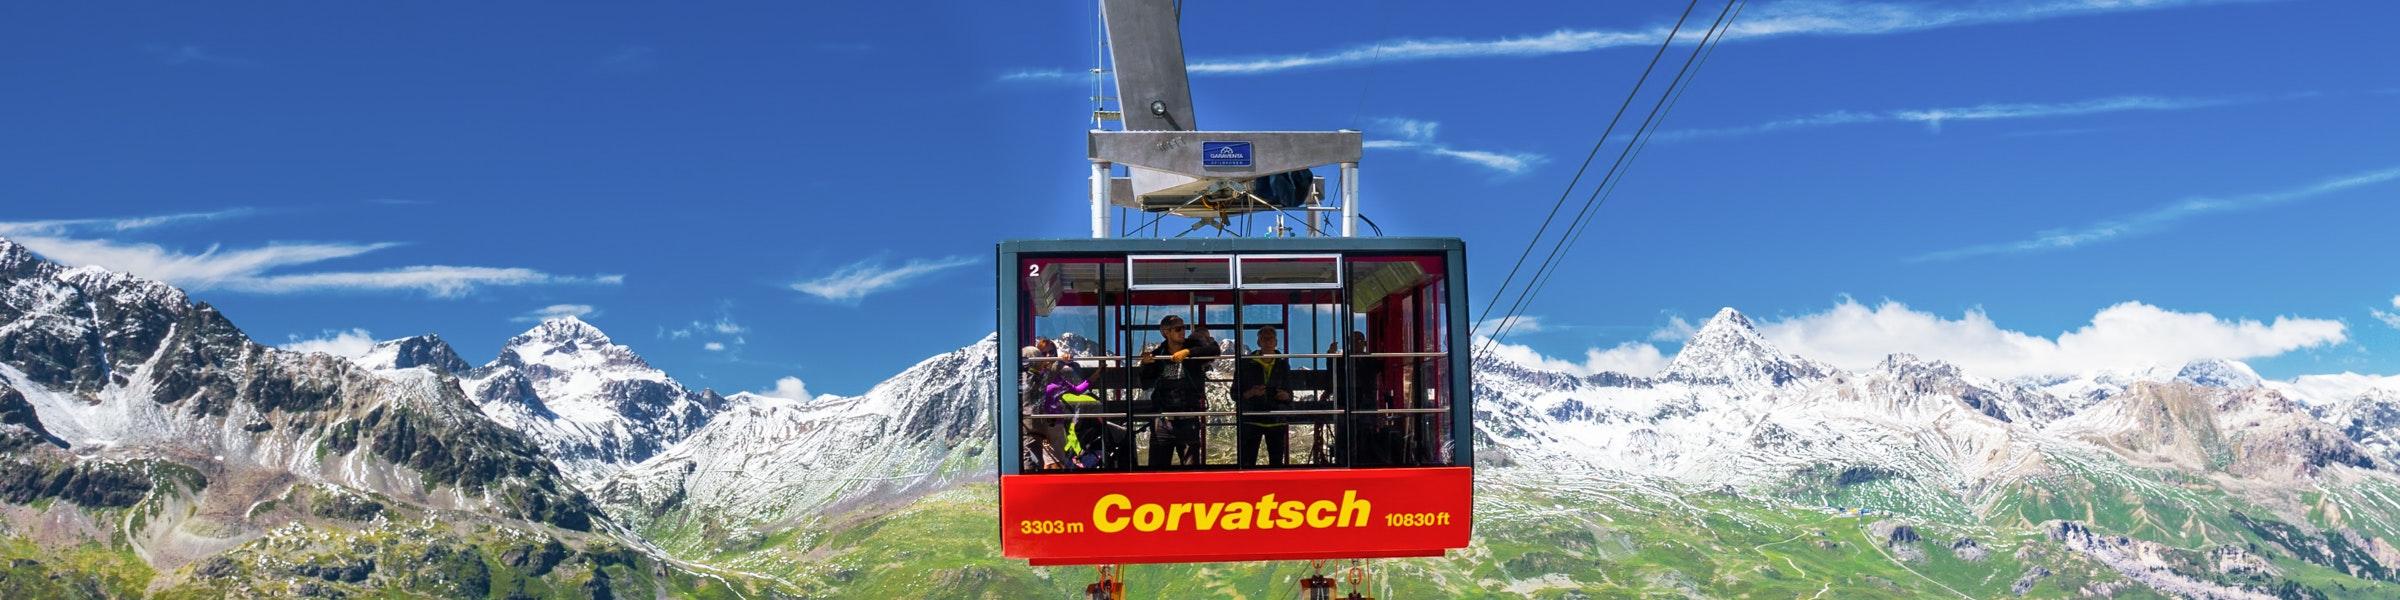 Cable car Murtèl Mount Corvatsch